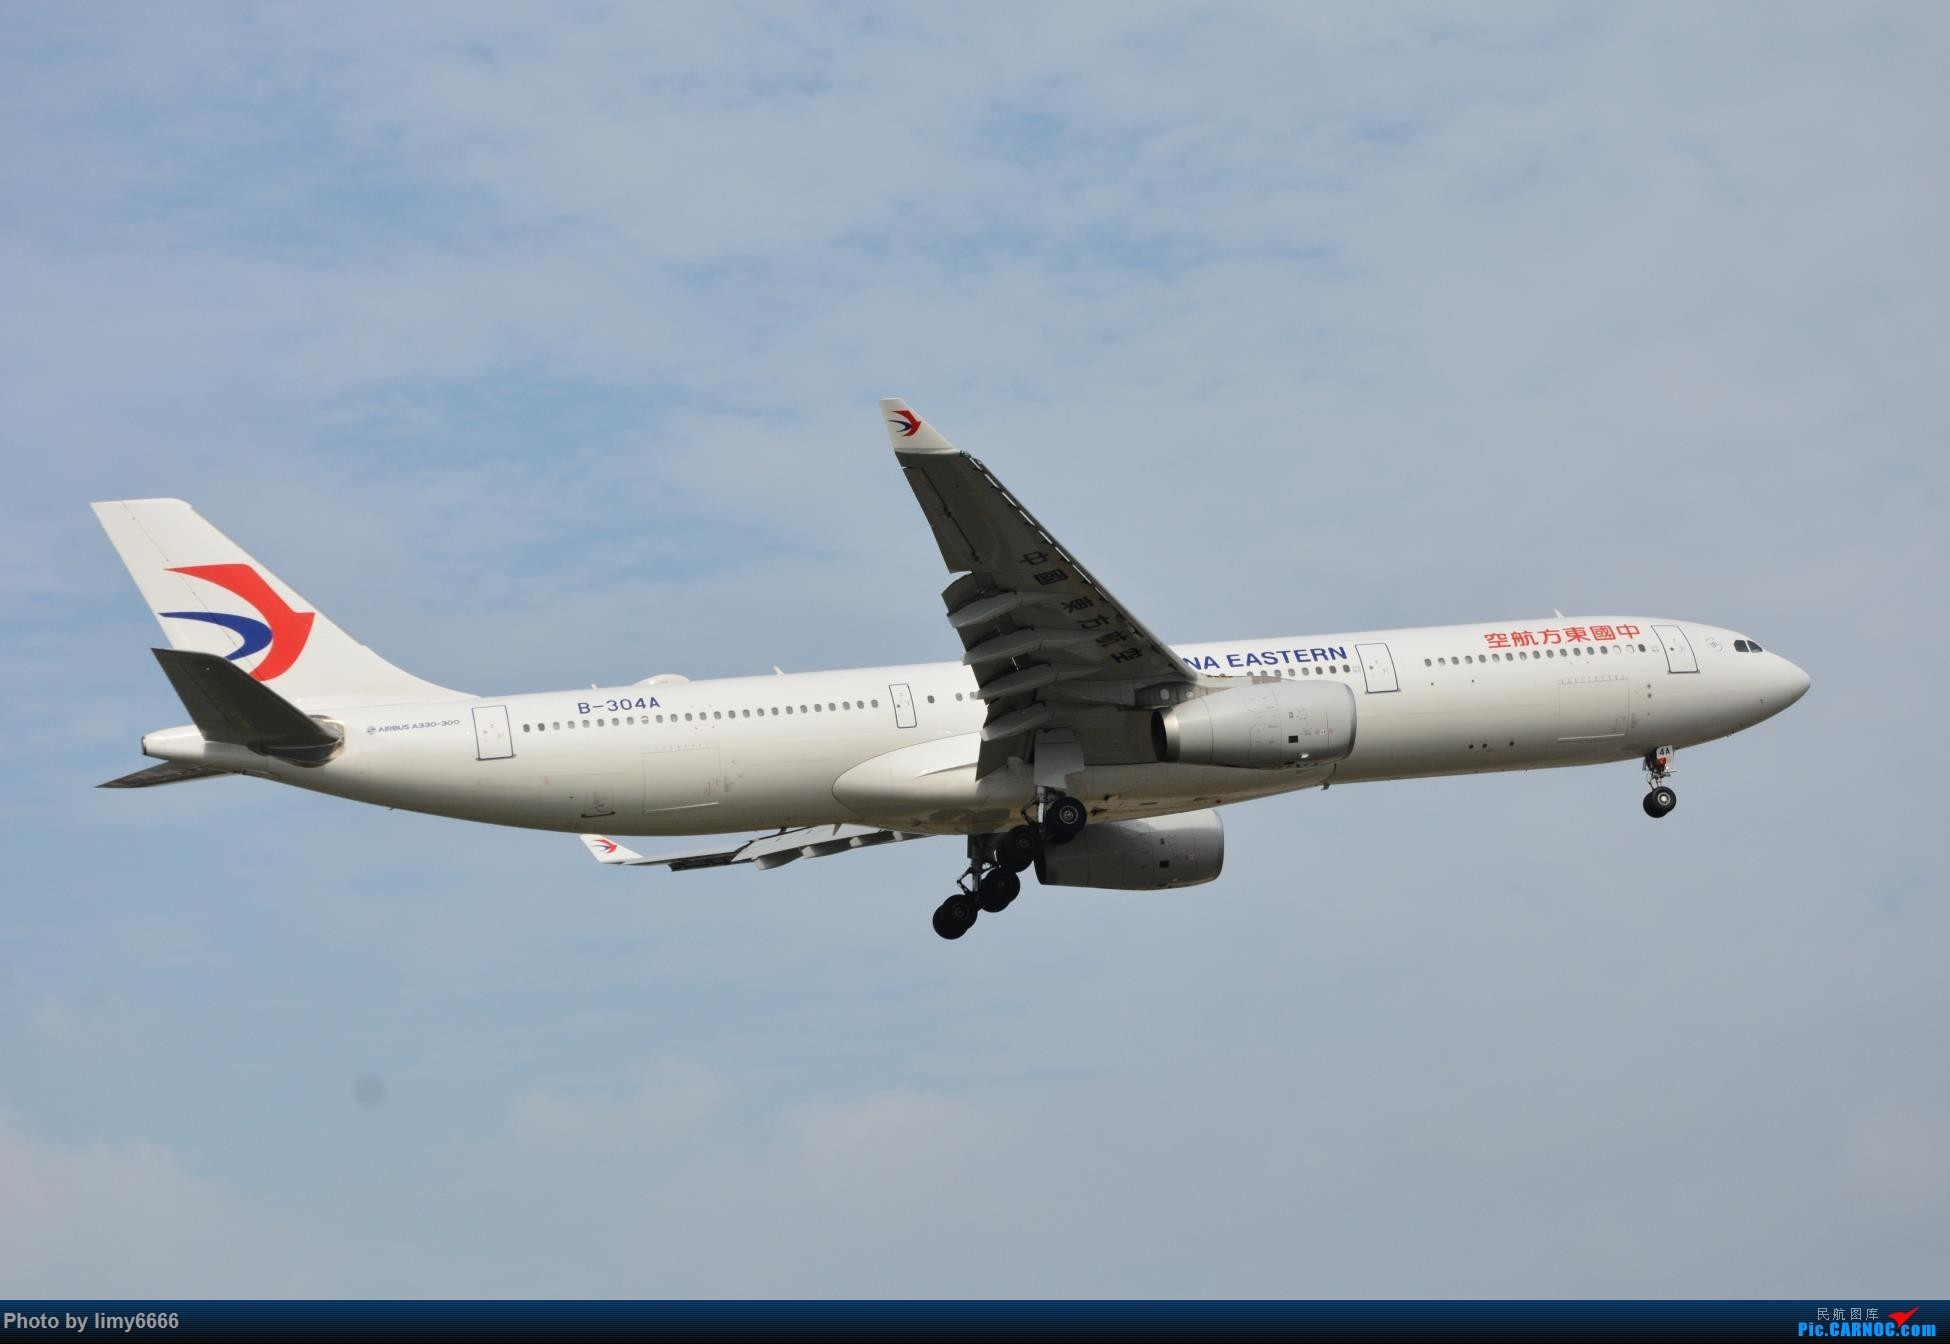 Re:[原创]上海虹桥机场拍机(在贵阳很少见或看不见的) AIRBUS A330-300 B-304A 中国上海虹桥国际机场